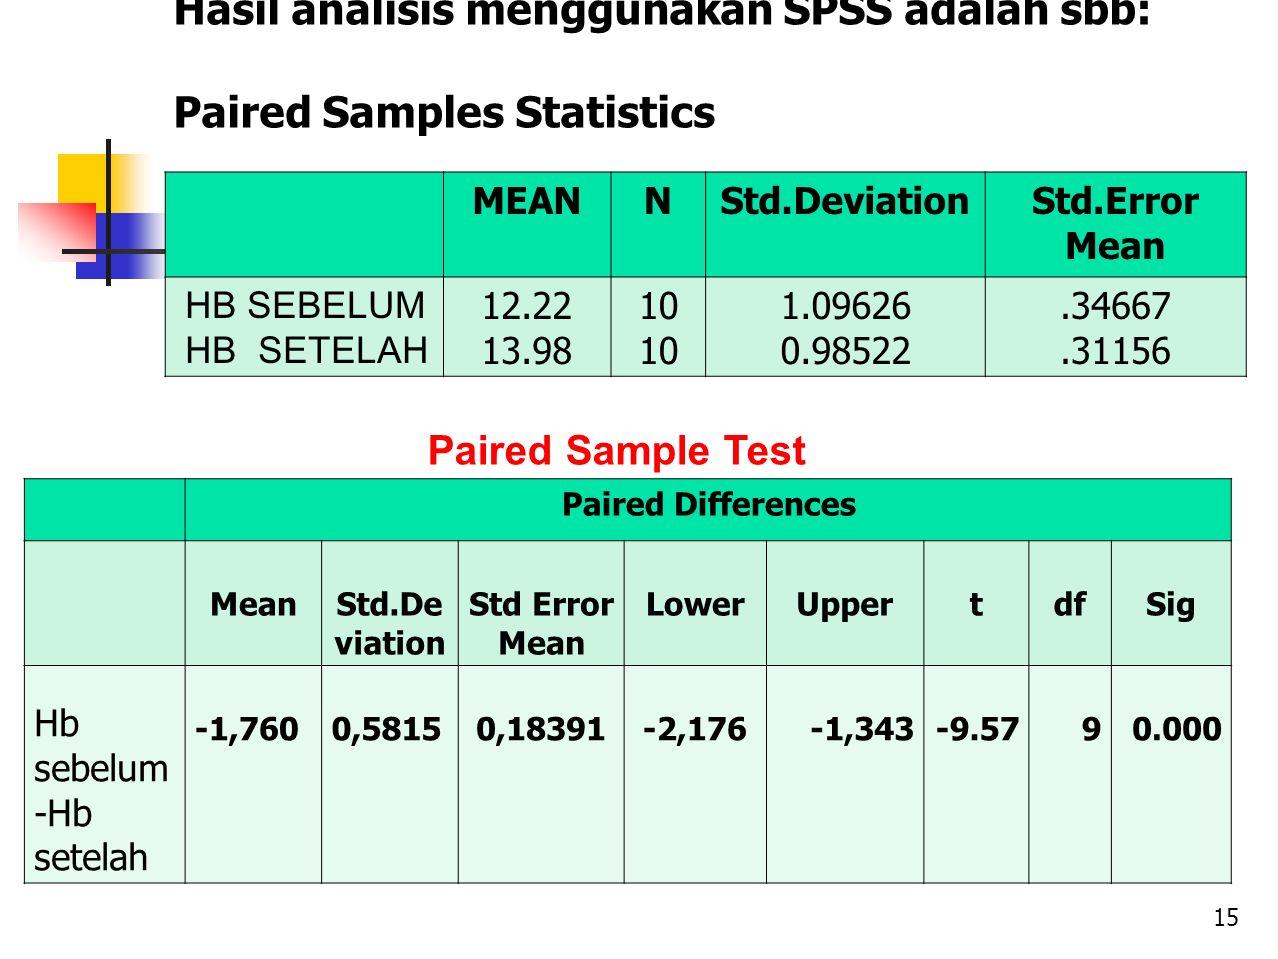 Hasil analisis menggunakan SPSS adalah sbb: Paired Samples Statistics MEANNStd.DeviationStd.Error Mean HB SEBELUM HB SETELAH 12.22 13.98 10 1.09626 0.98522.34667.31156 Paired Differences MeanStd.De viation Std Error Mean LowerUppertdfSig Hb sebelum -Hb setelah -1,7600,58150,18391-2,176-1,343-9.5790.000 Paired Sample Test 15